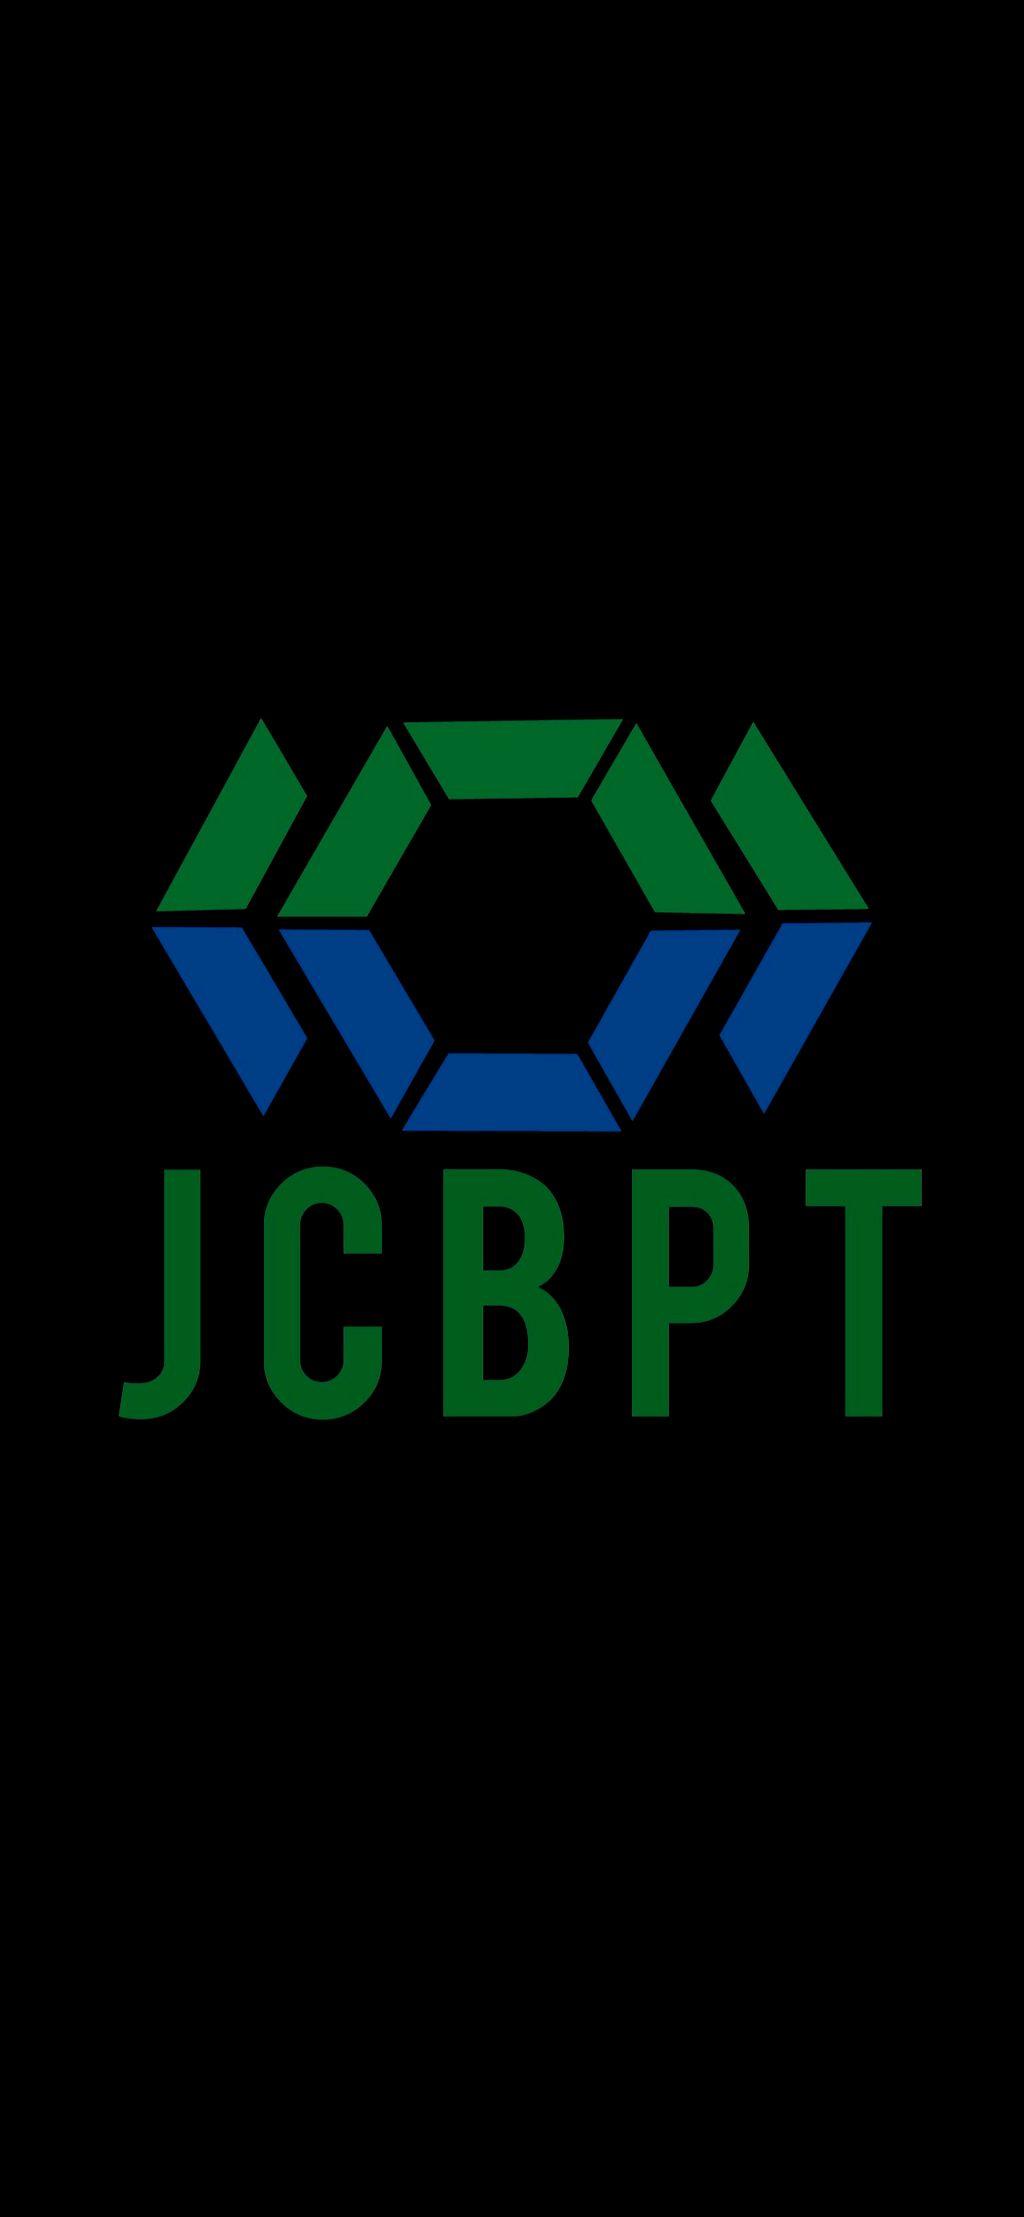 CYPRESS/77055 - JCBPT